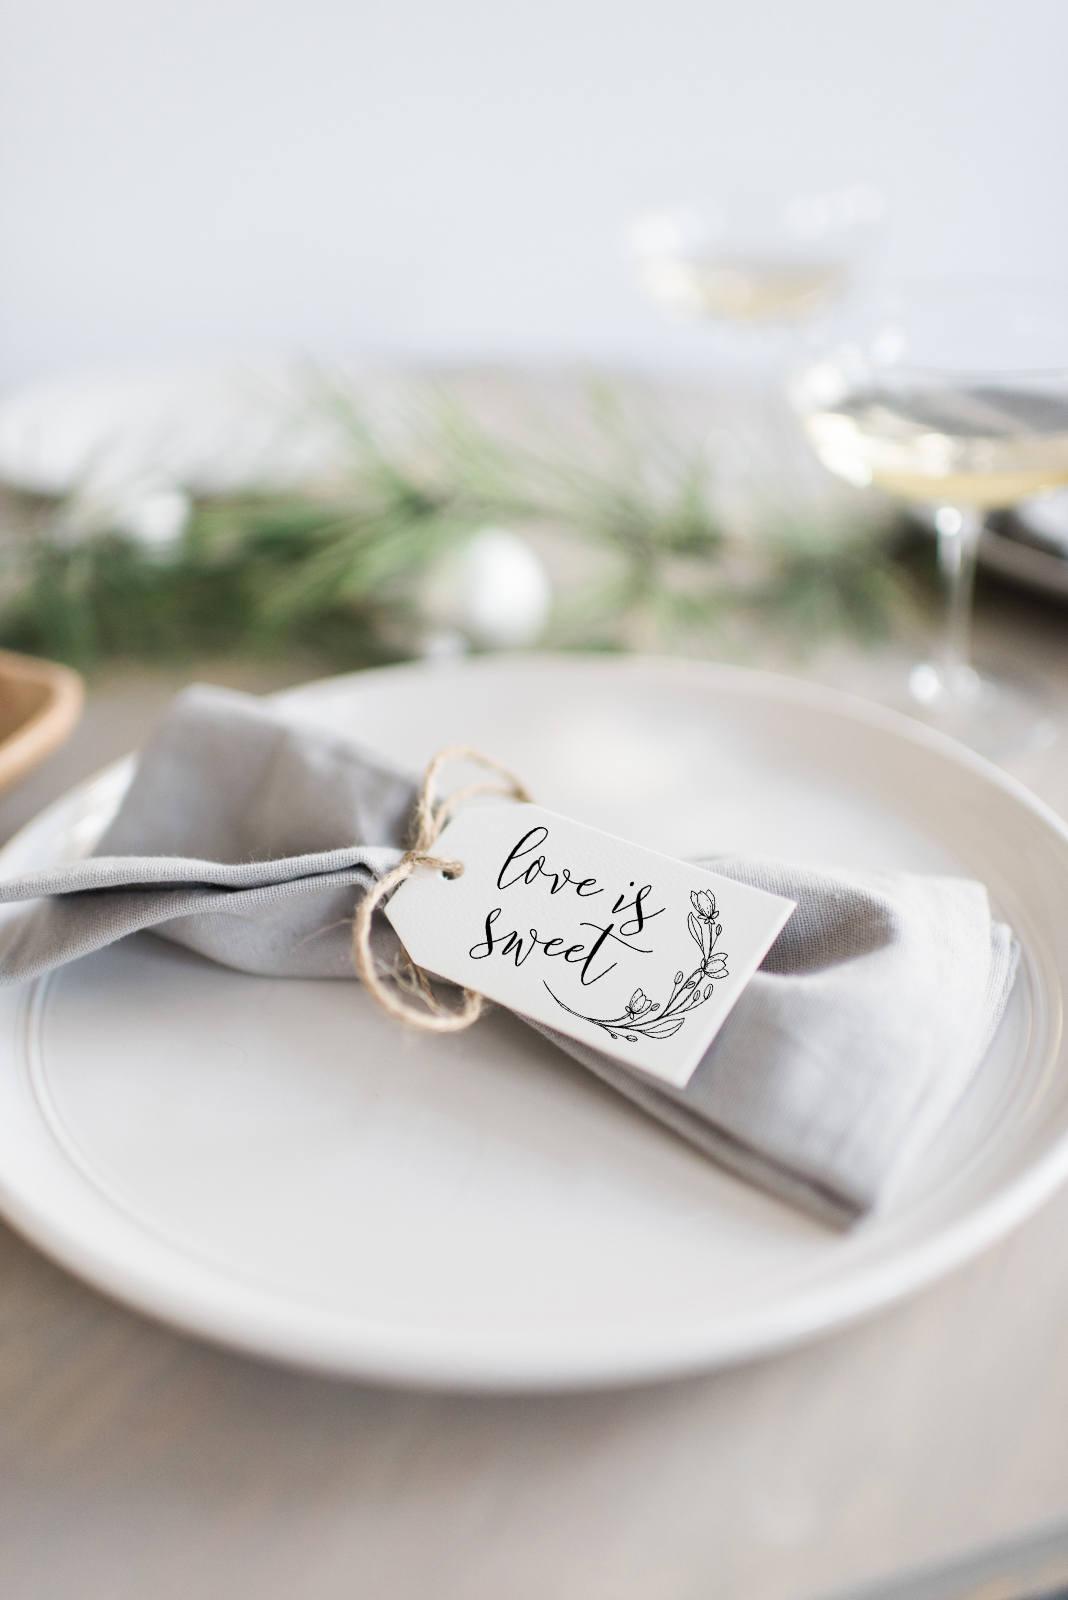 Silverware Tags Place Setting Tags Wedding Tags Bridal